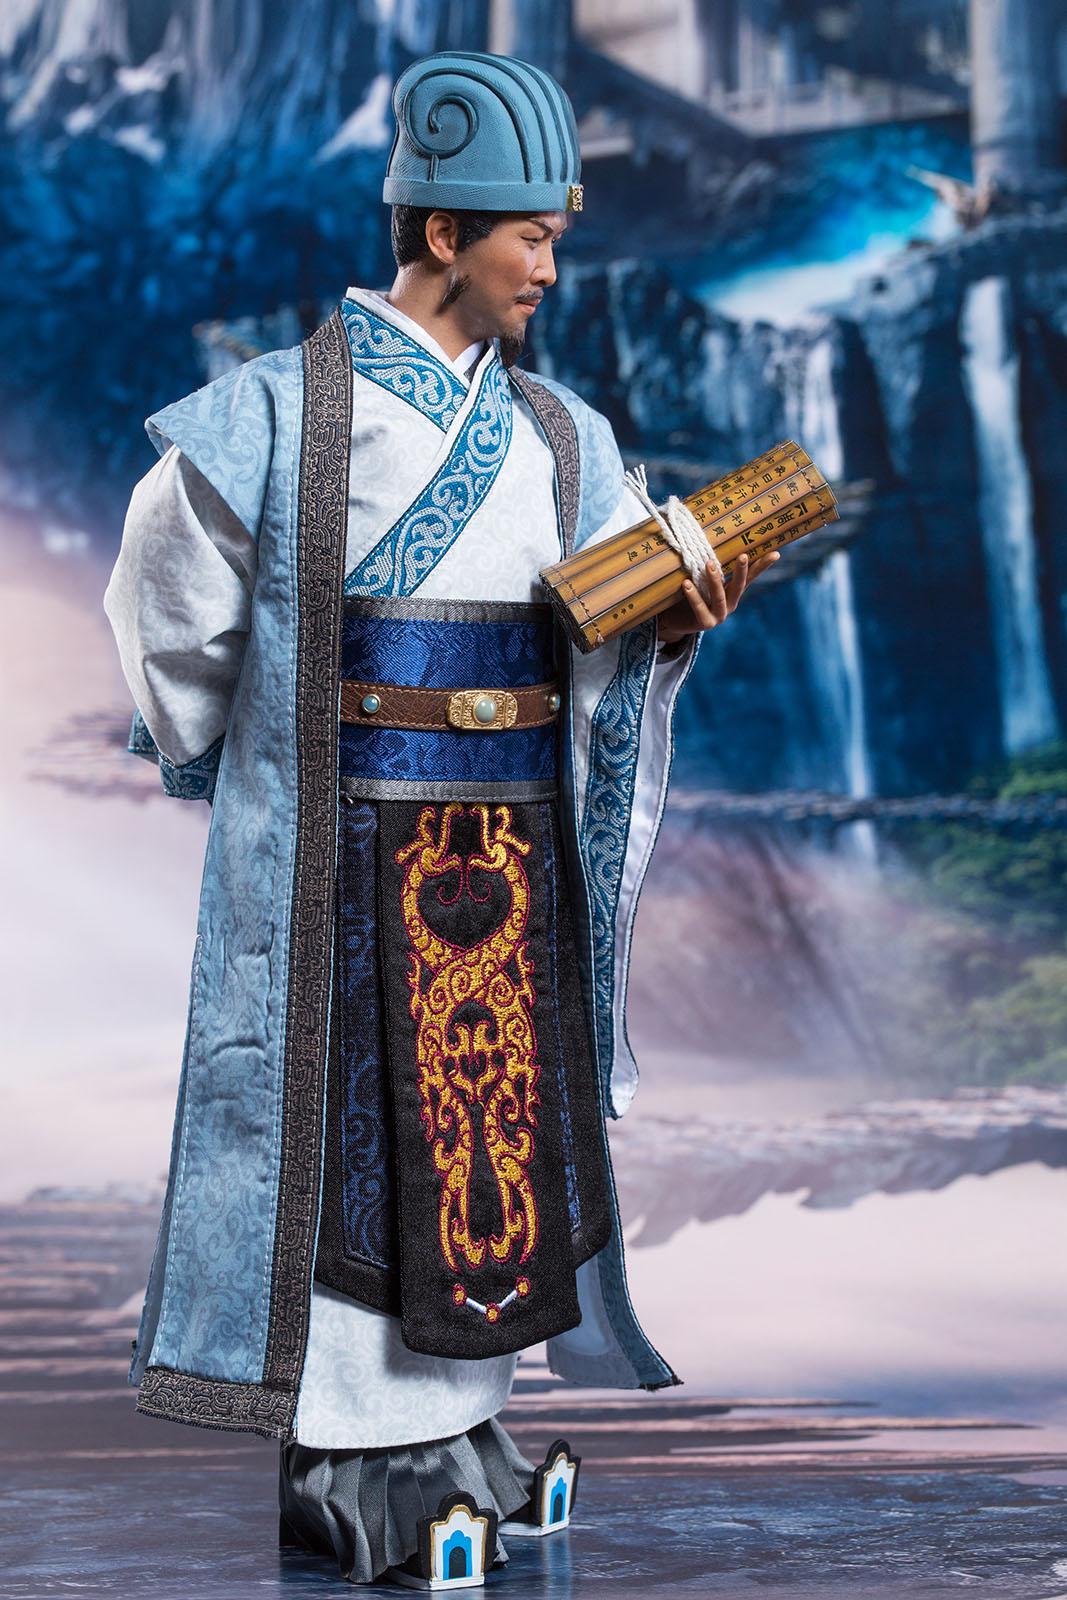 303toys Zhuge Liang สามก๊กวิกิ